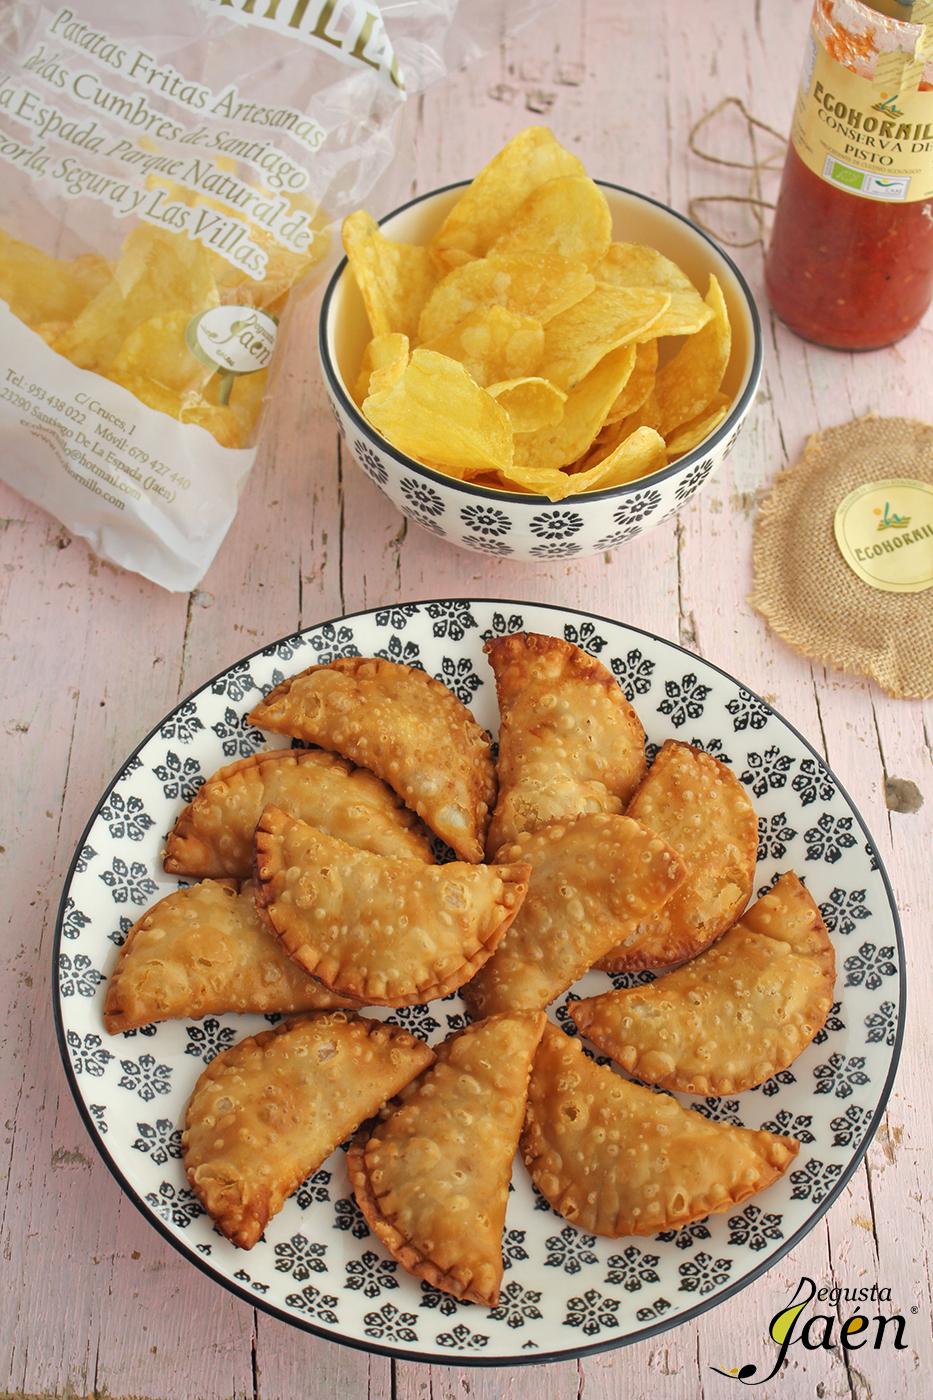 Empanadillas de atun y pisto Ecohornillo Degusta Jaen (3)